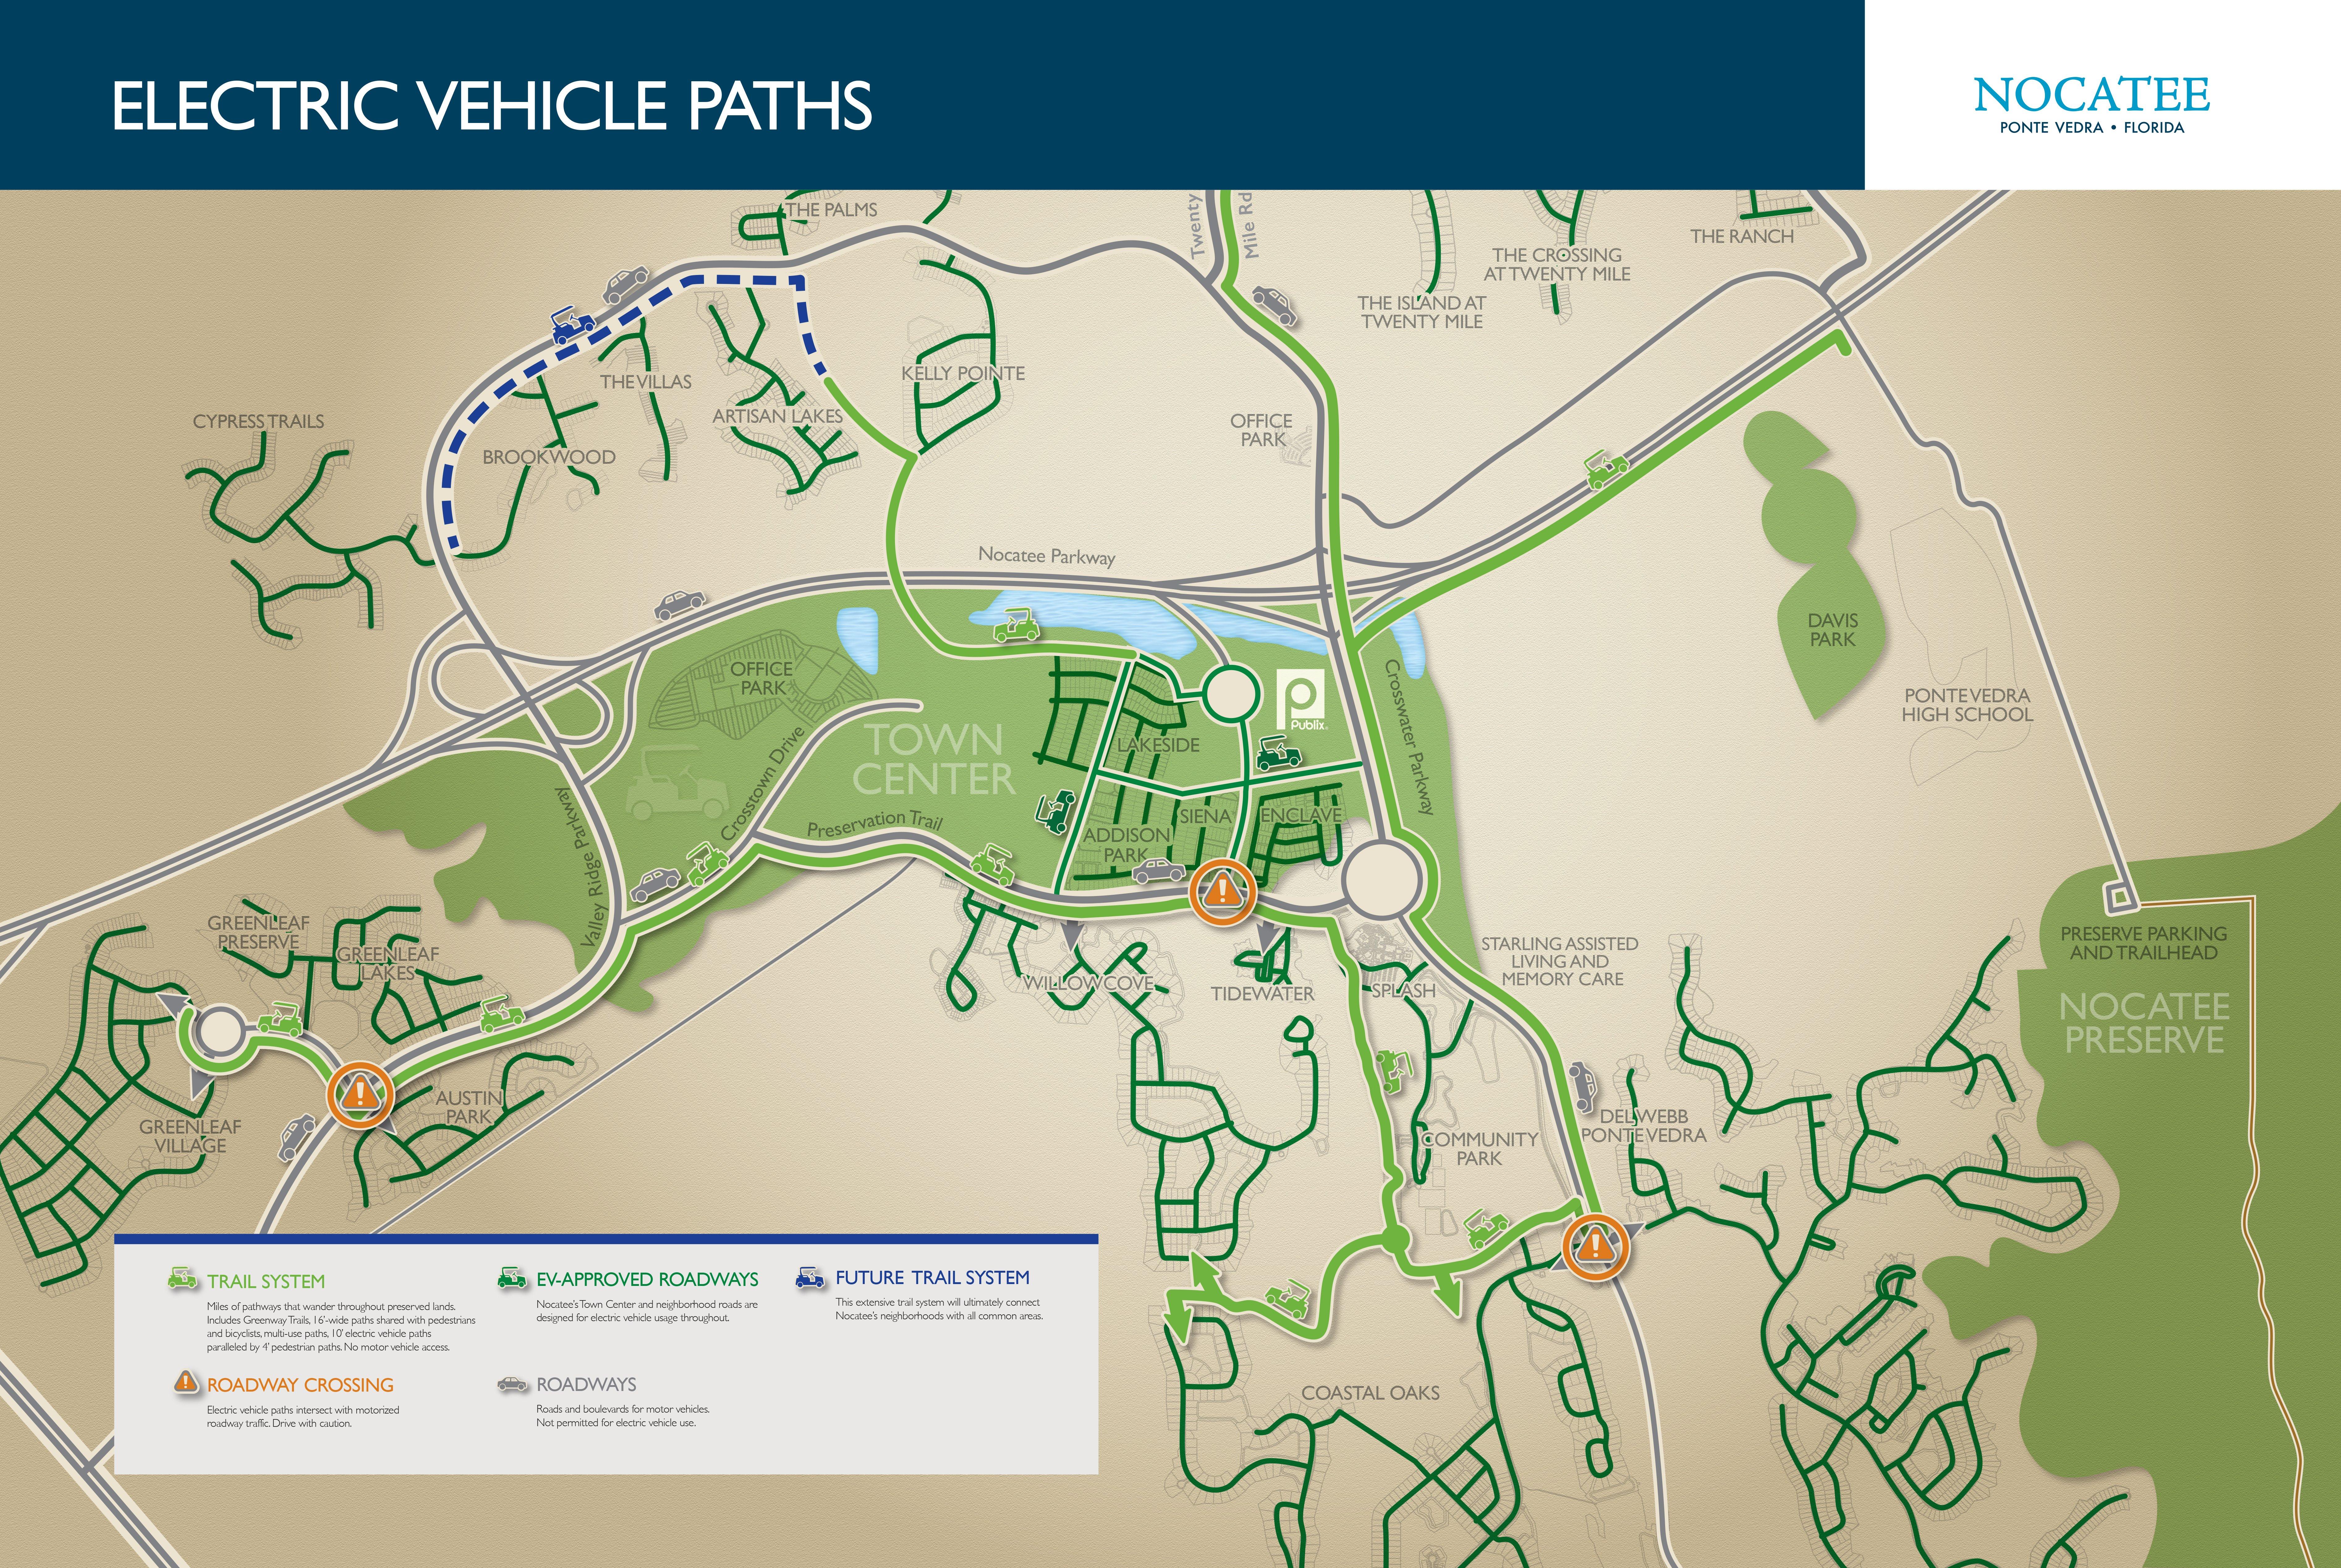 NOC-16023_Electric_Vehicle_Path_Map_Updates_12-19-16